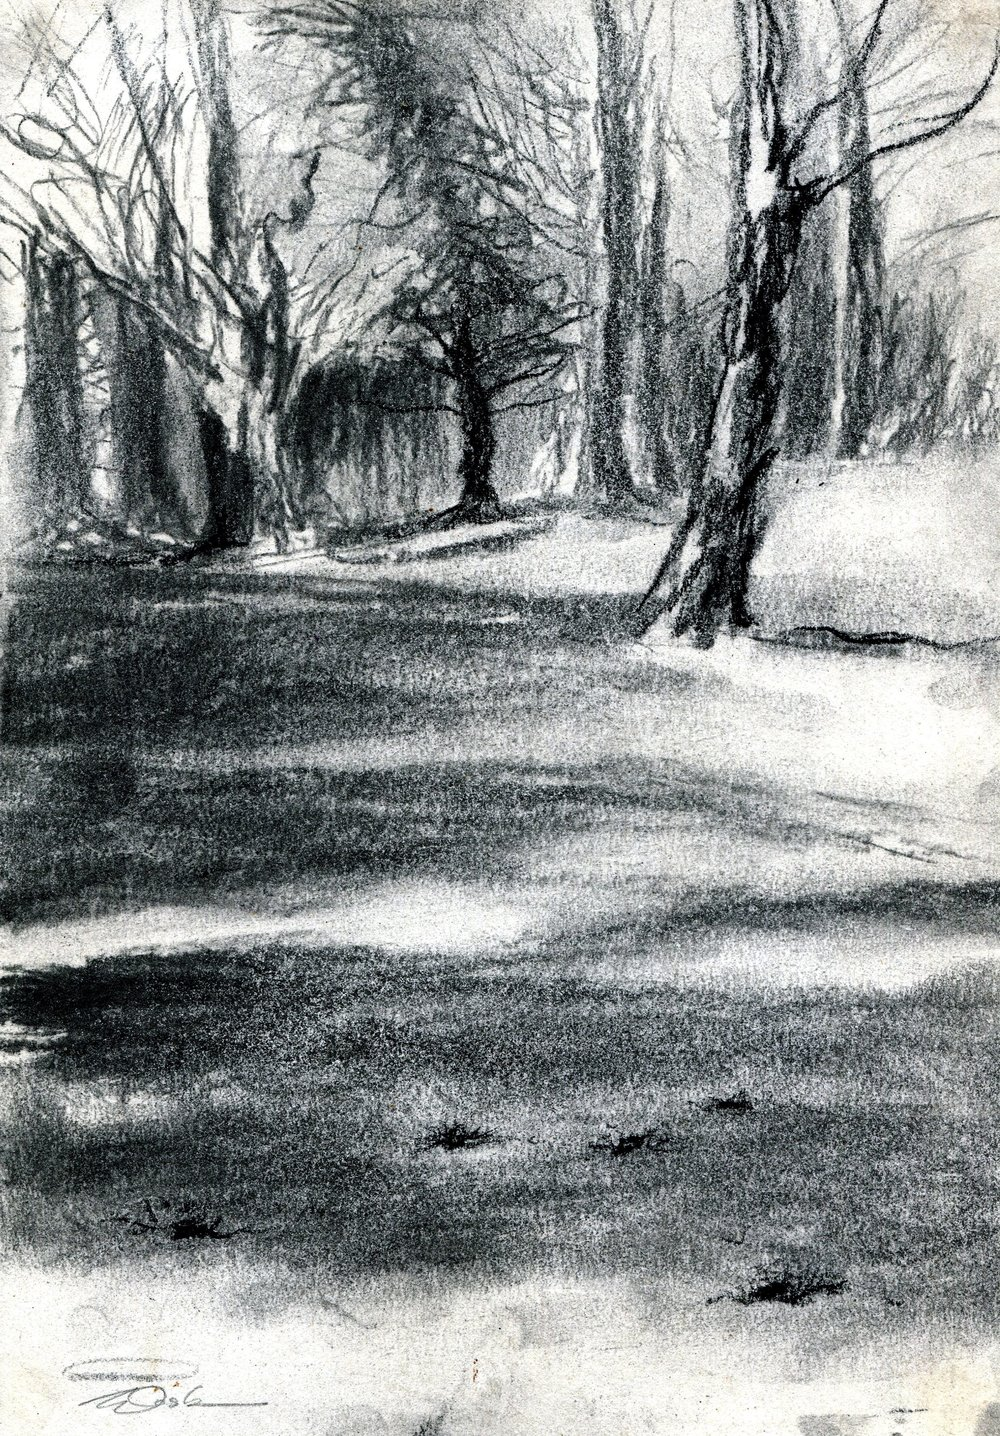 88a Saskia Osborne, Winter 1, Charcoal & conte on paper